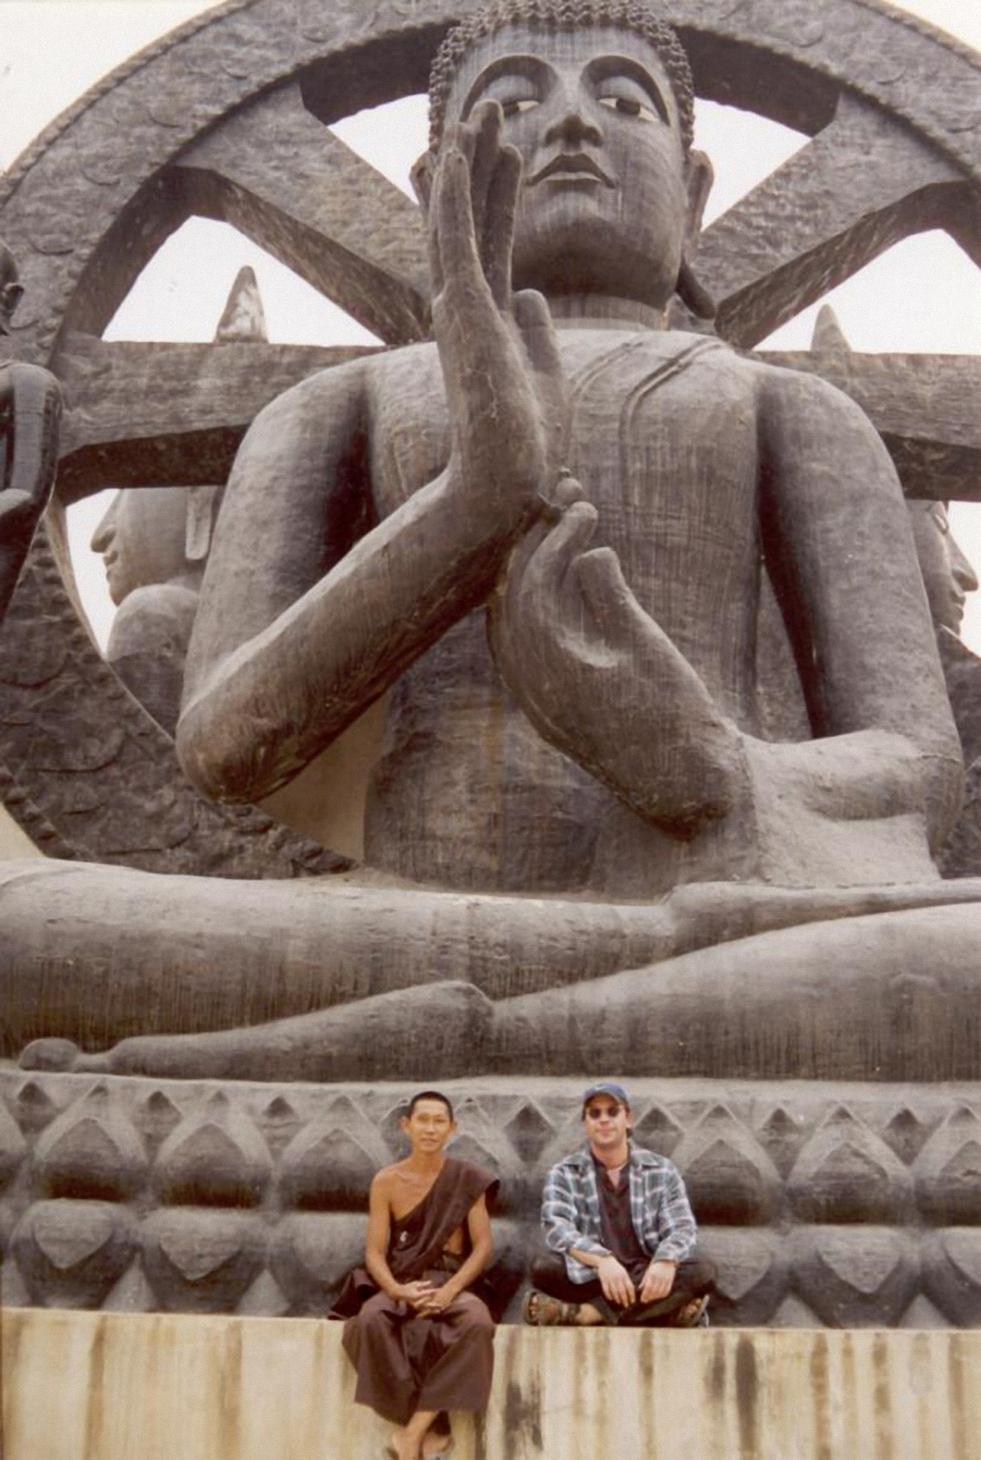 Patrick Kroupa Thailand 1999